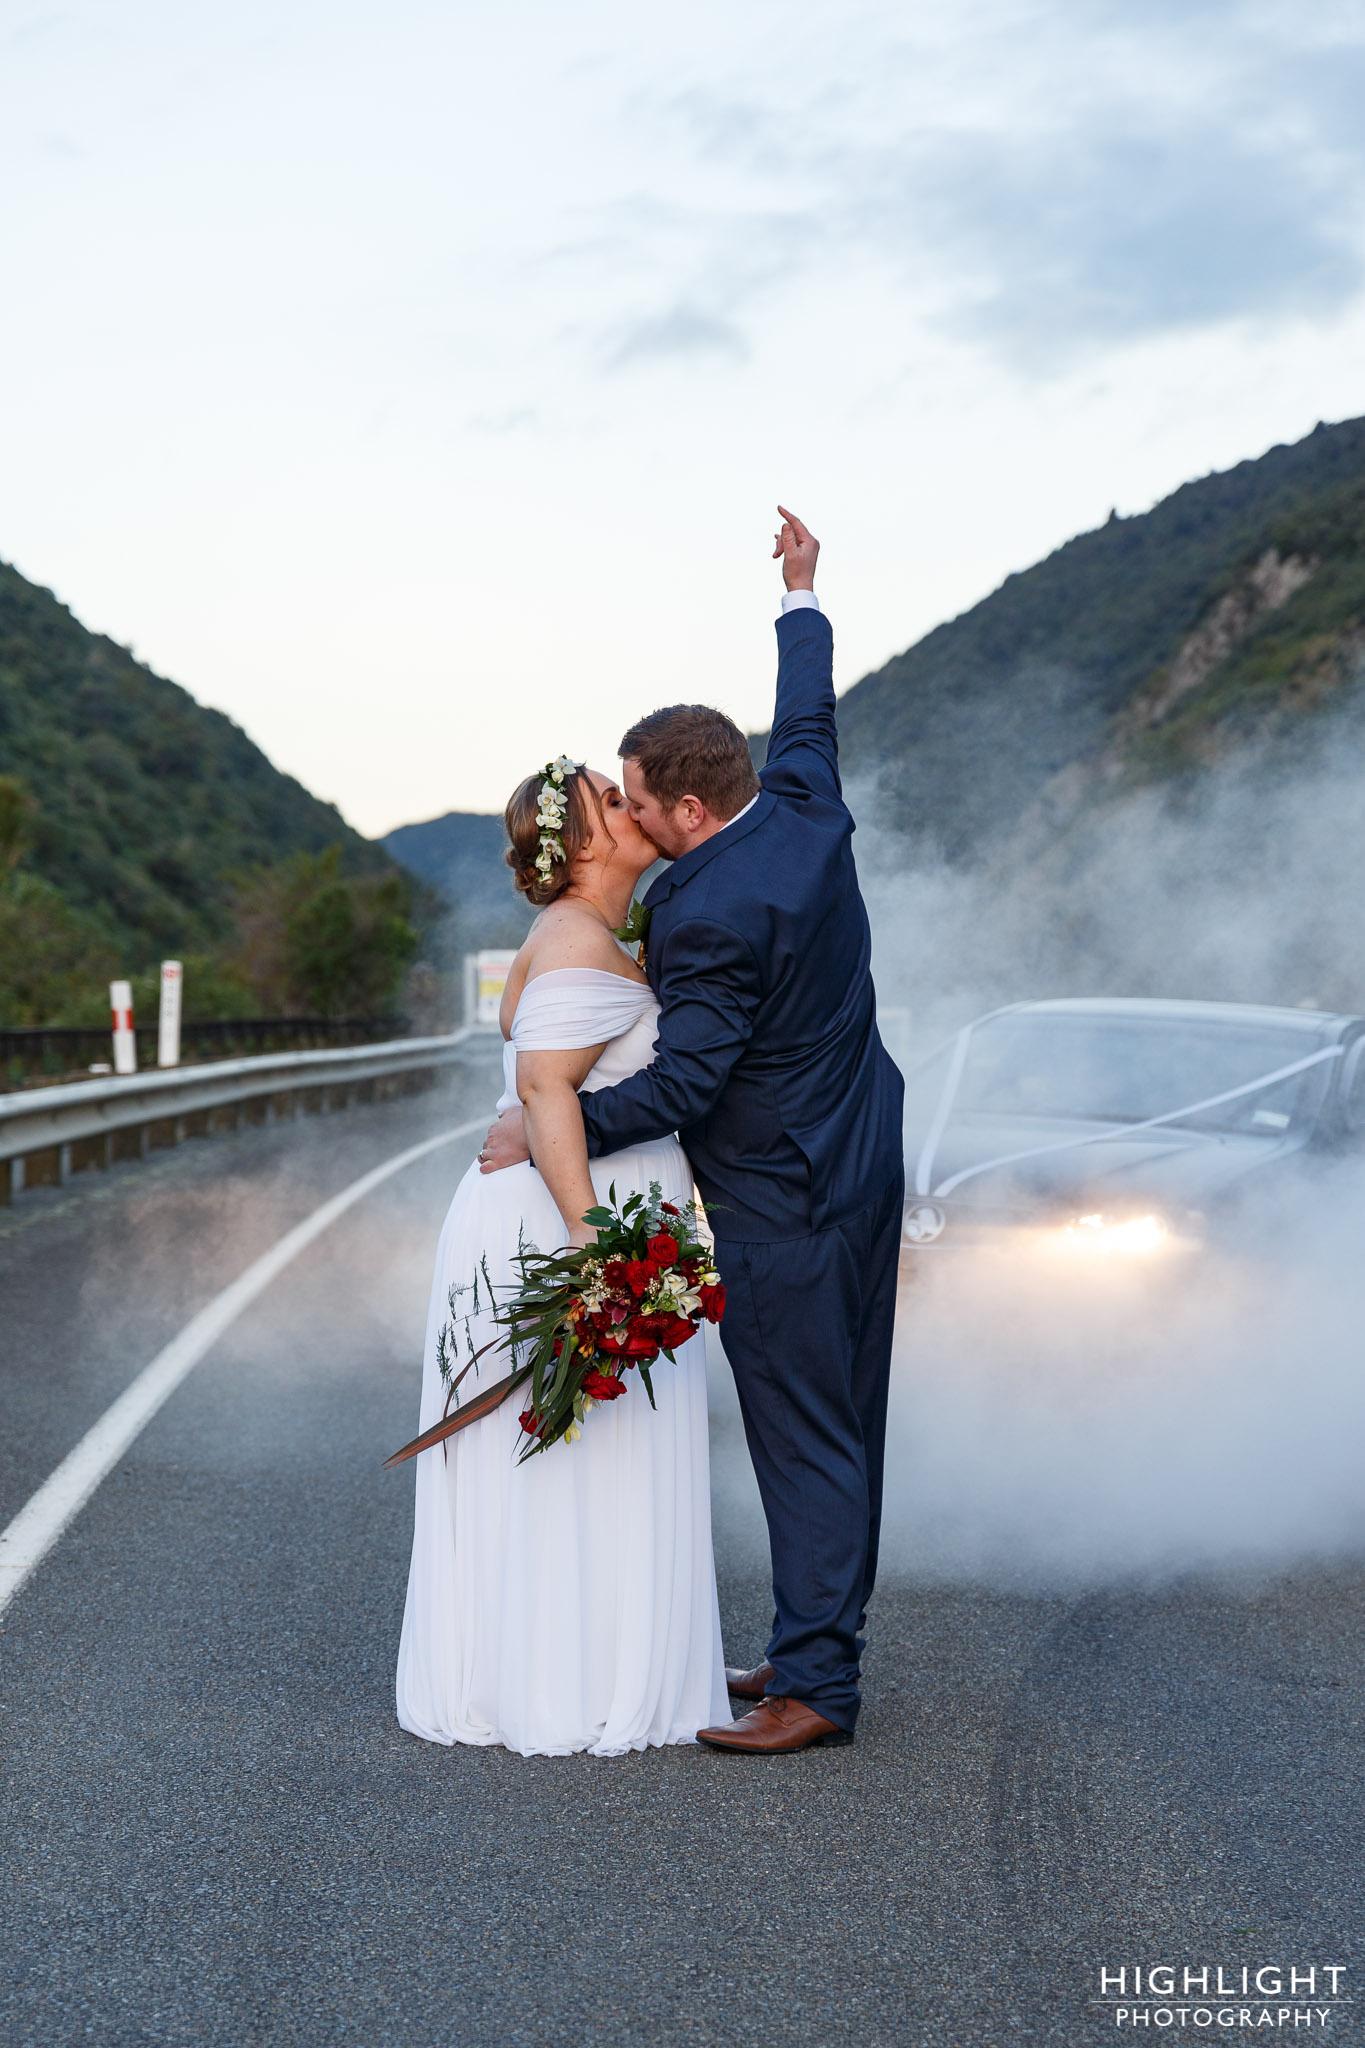 Highlight-wedding-photography-new-zealand-palmerston-north-99.jpg